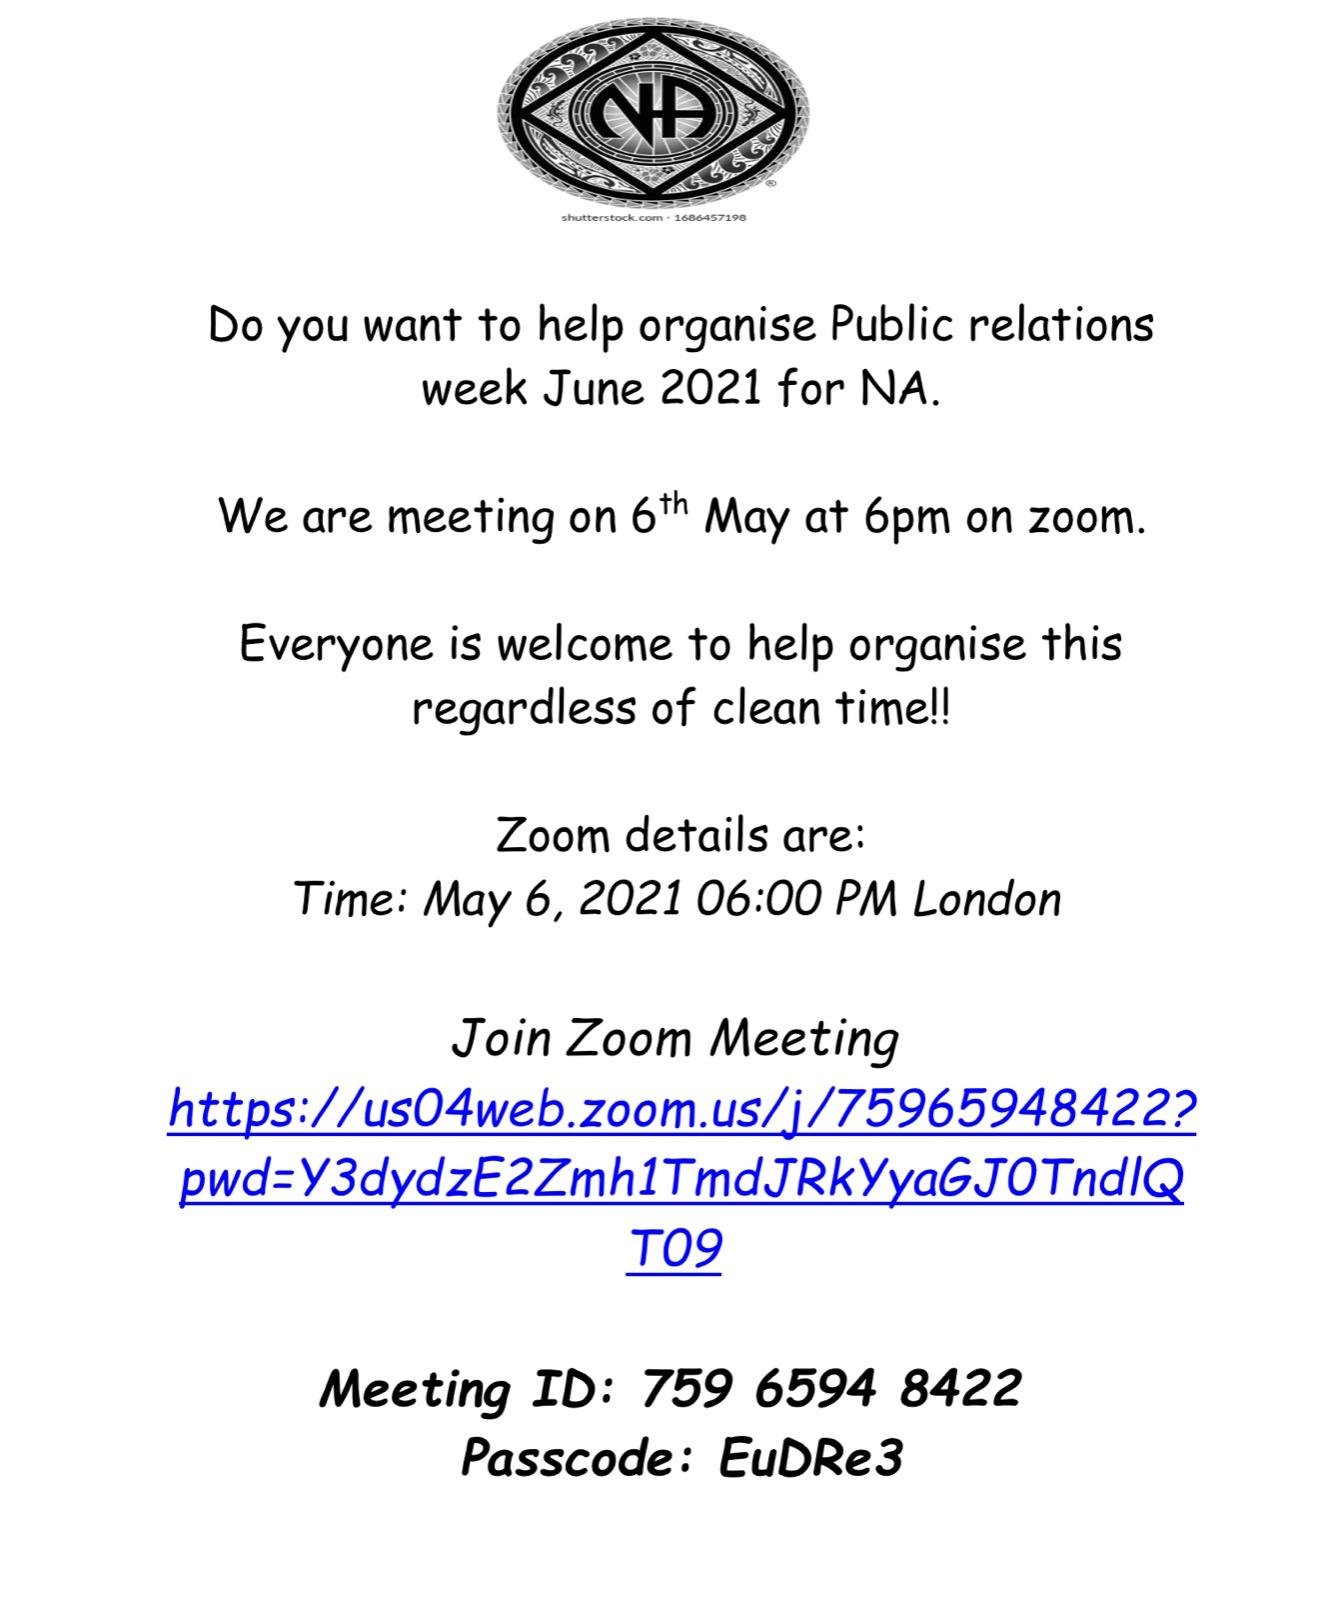 Public Relations Week June 2021